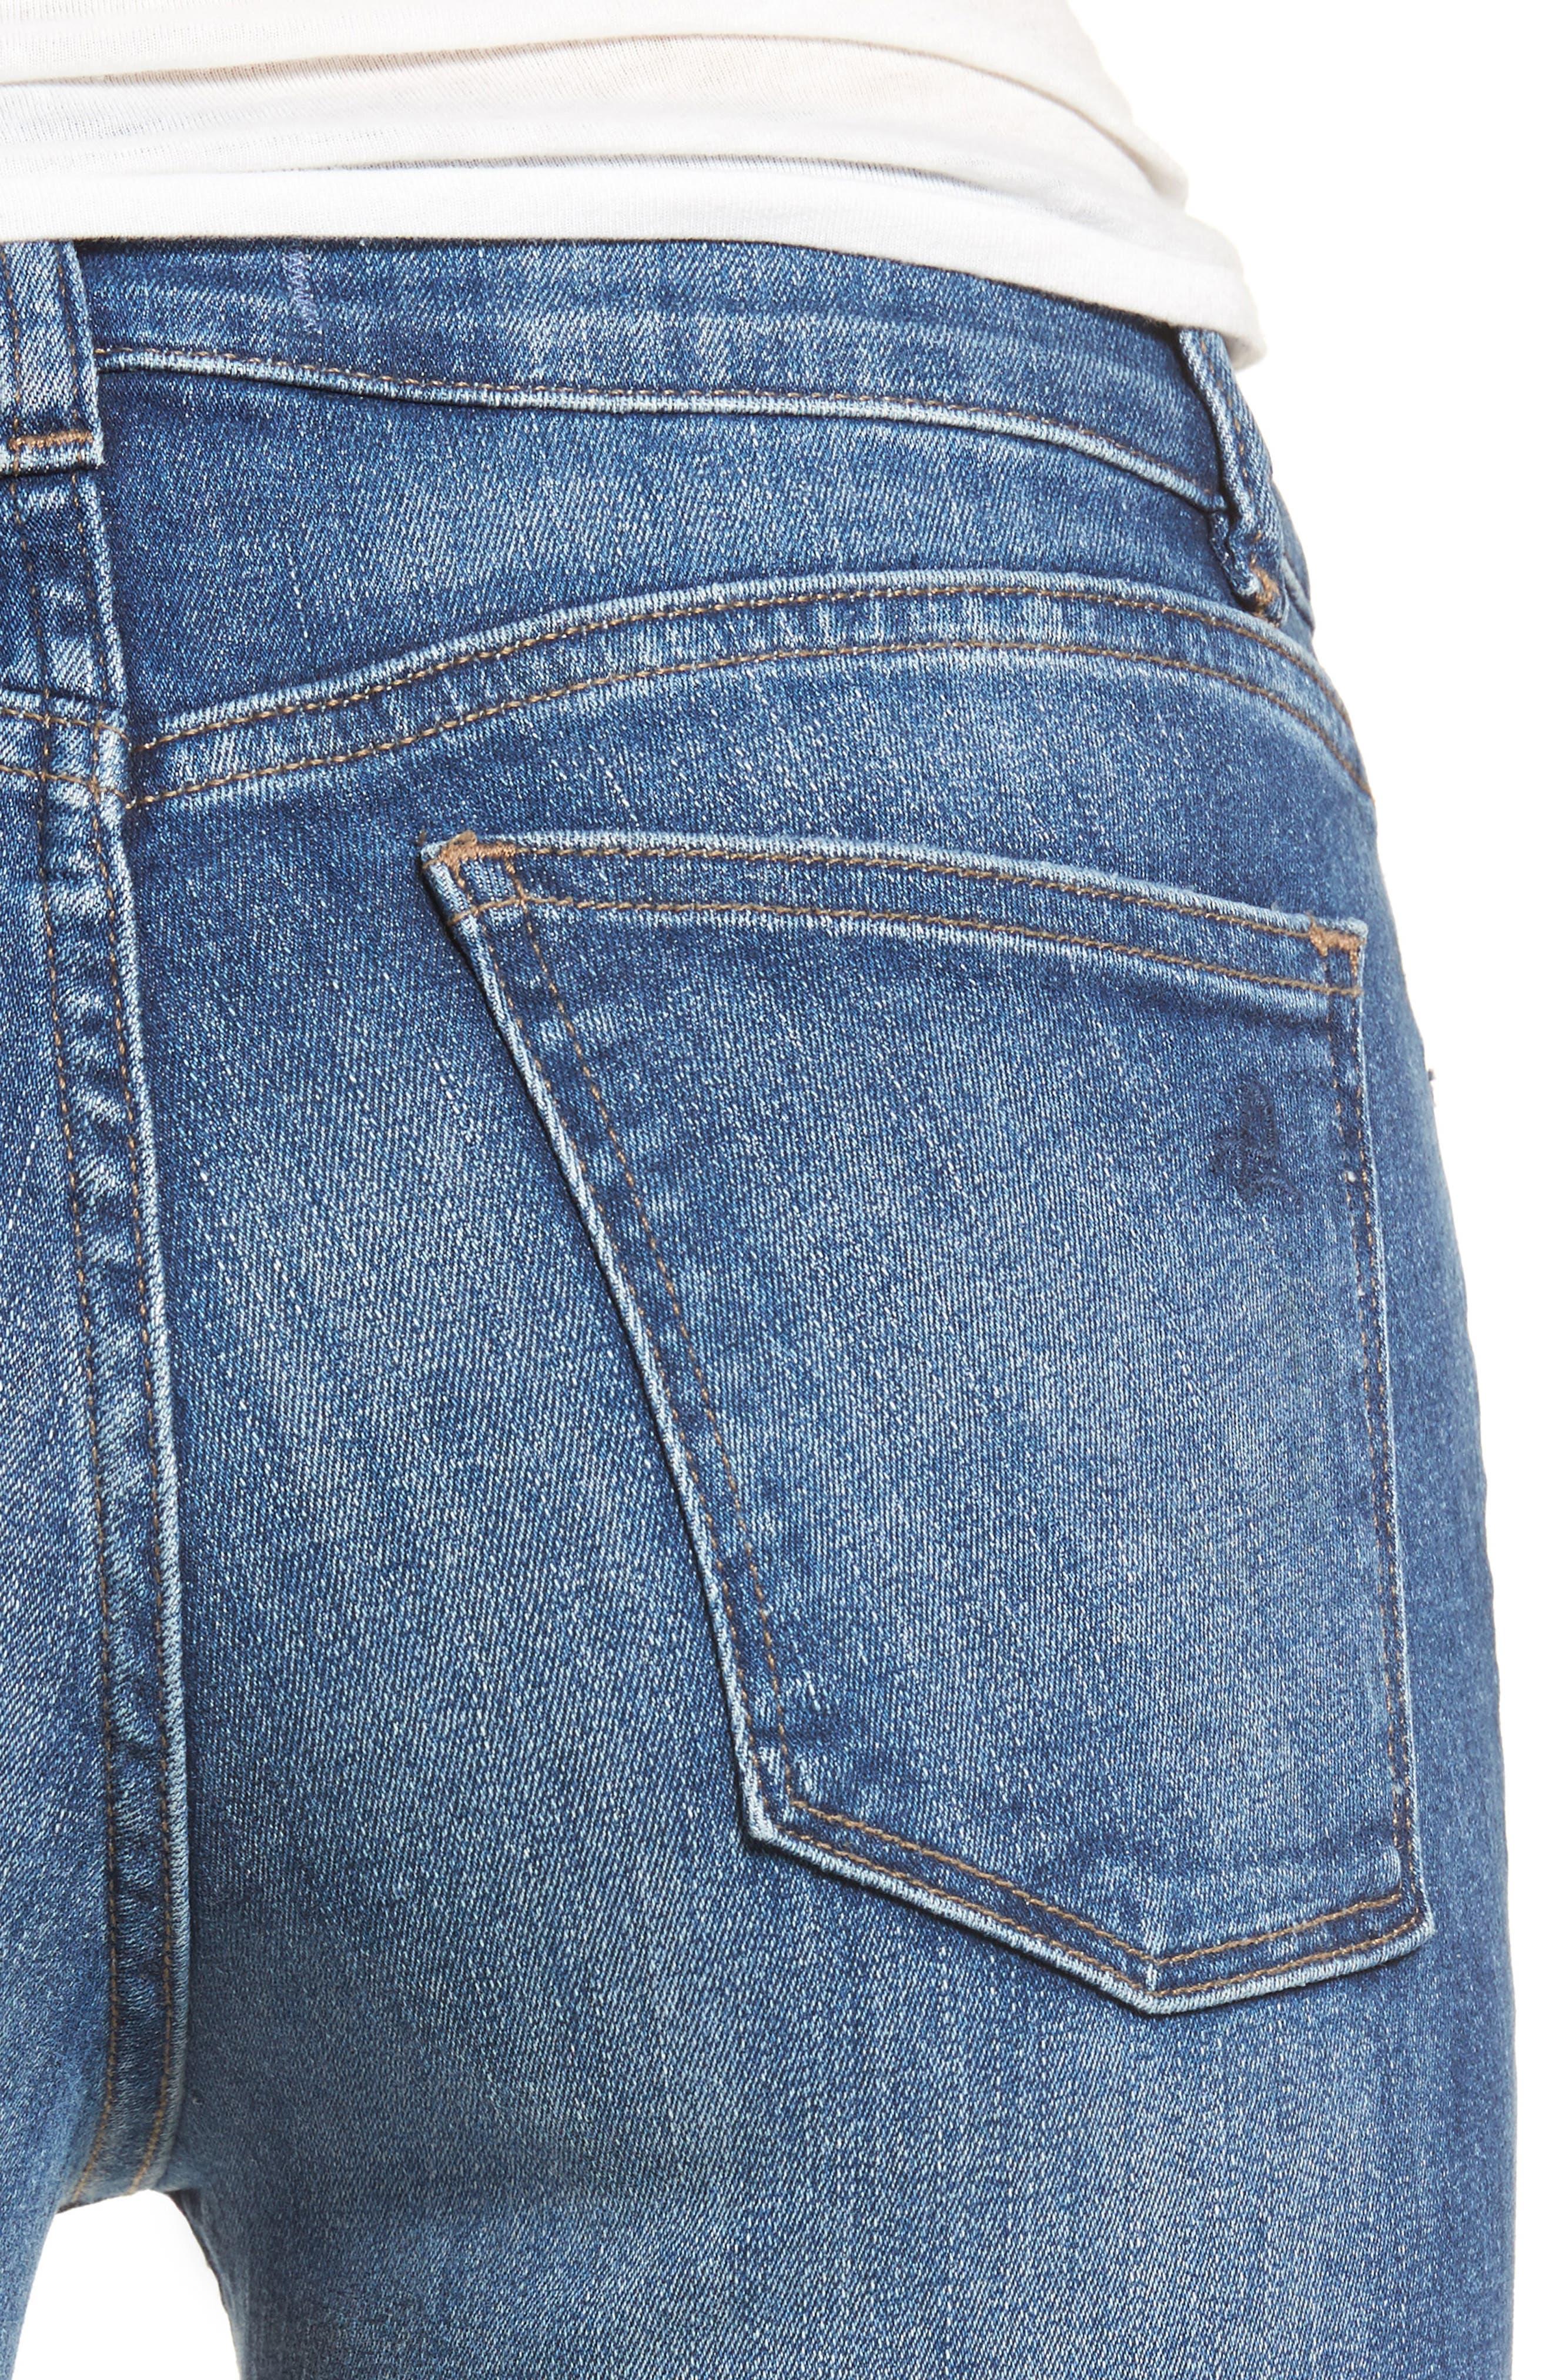 Mara Ankle Straight Leg Jeans,                             Alternate thumbnail 4, color,                             Fillmore